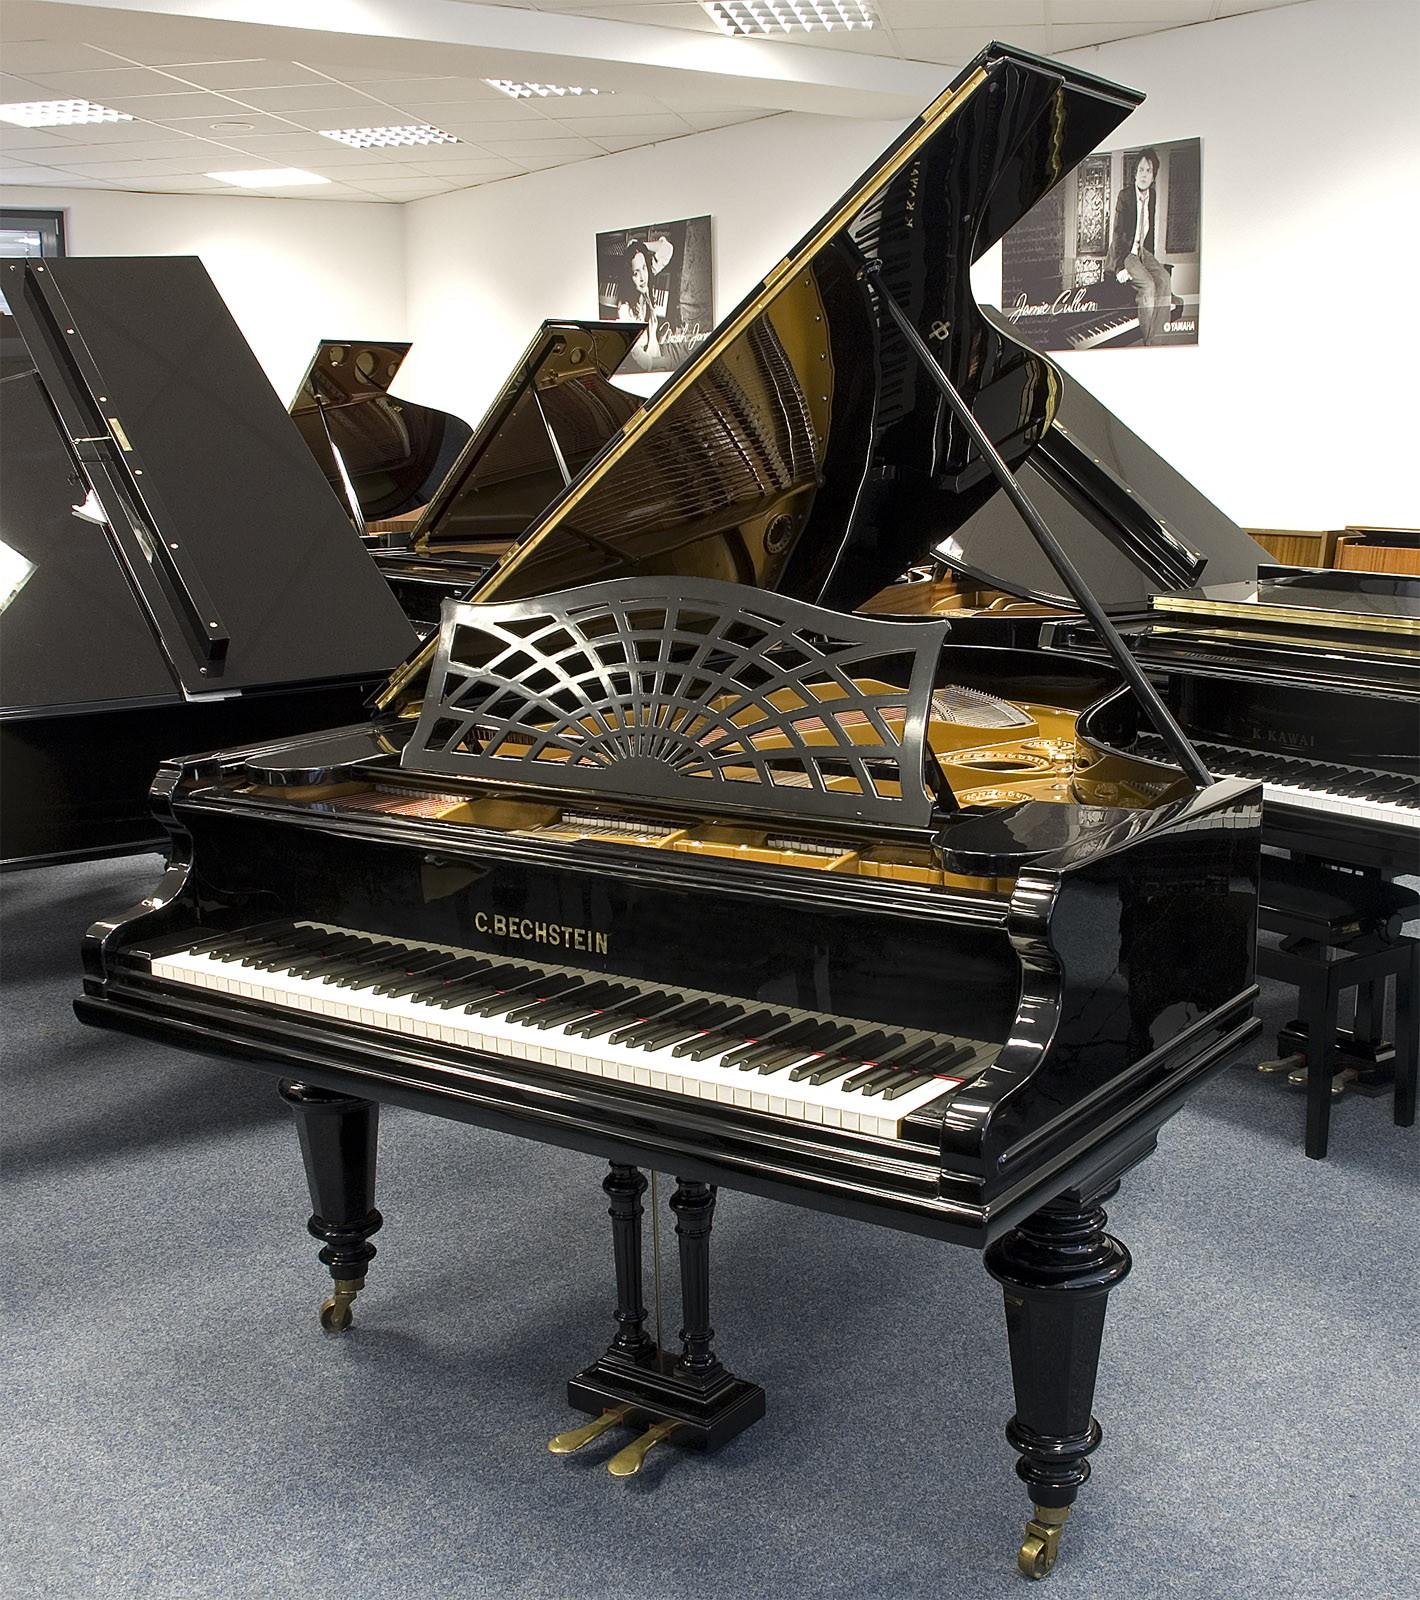 C Bechstein Flügel B203 Grand Piano gebraucht 5 J Gar